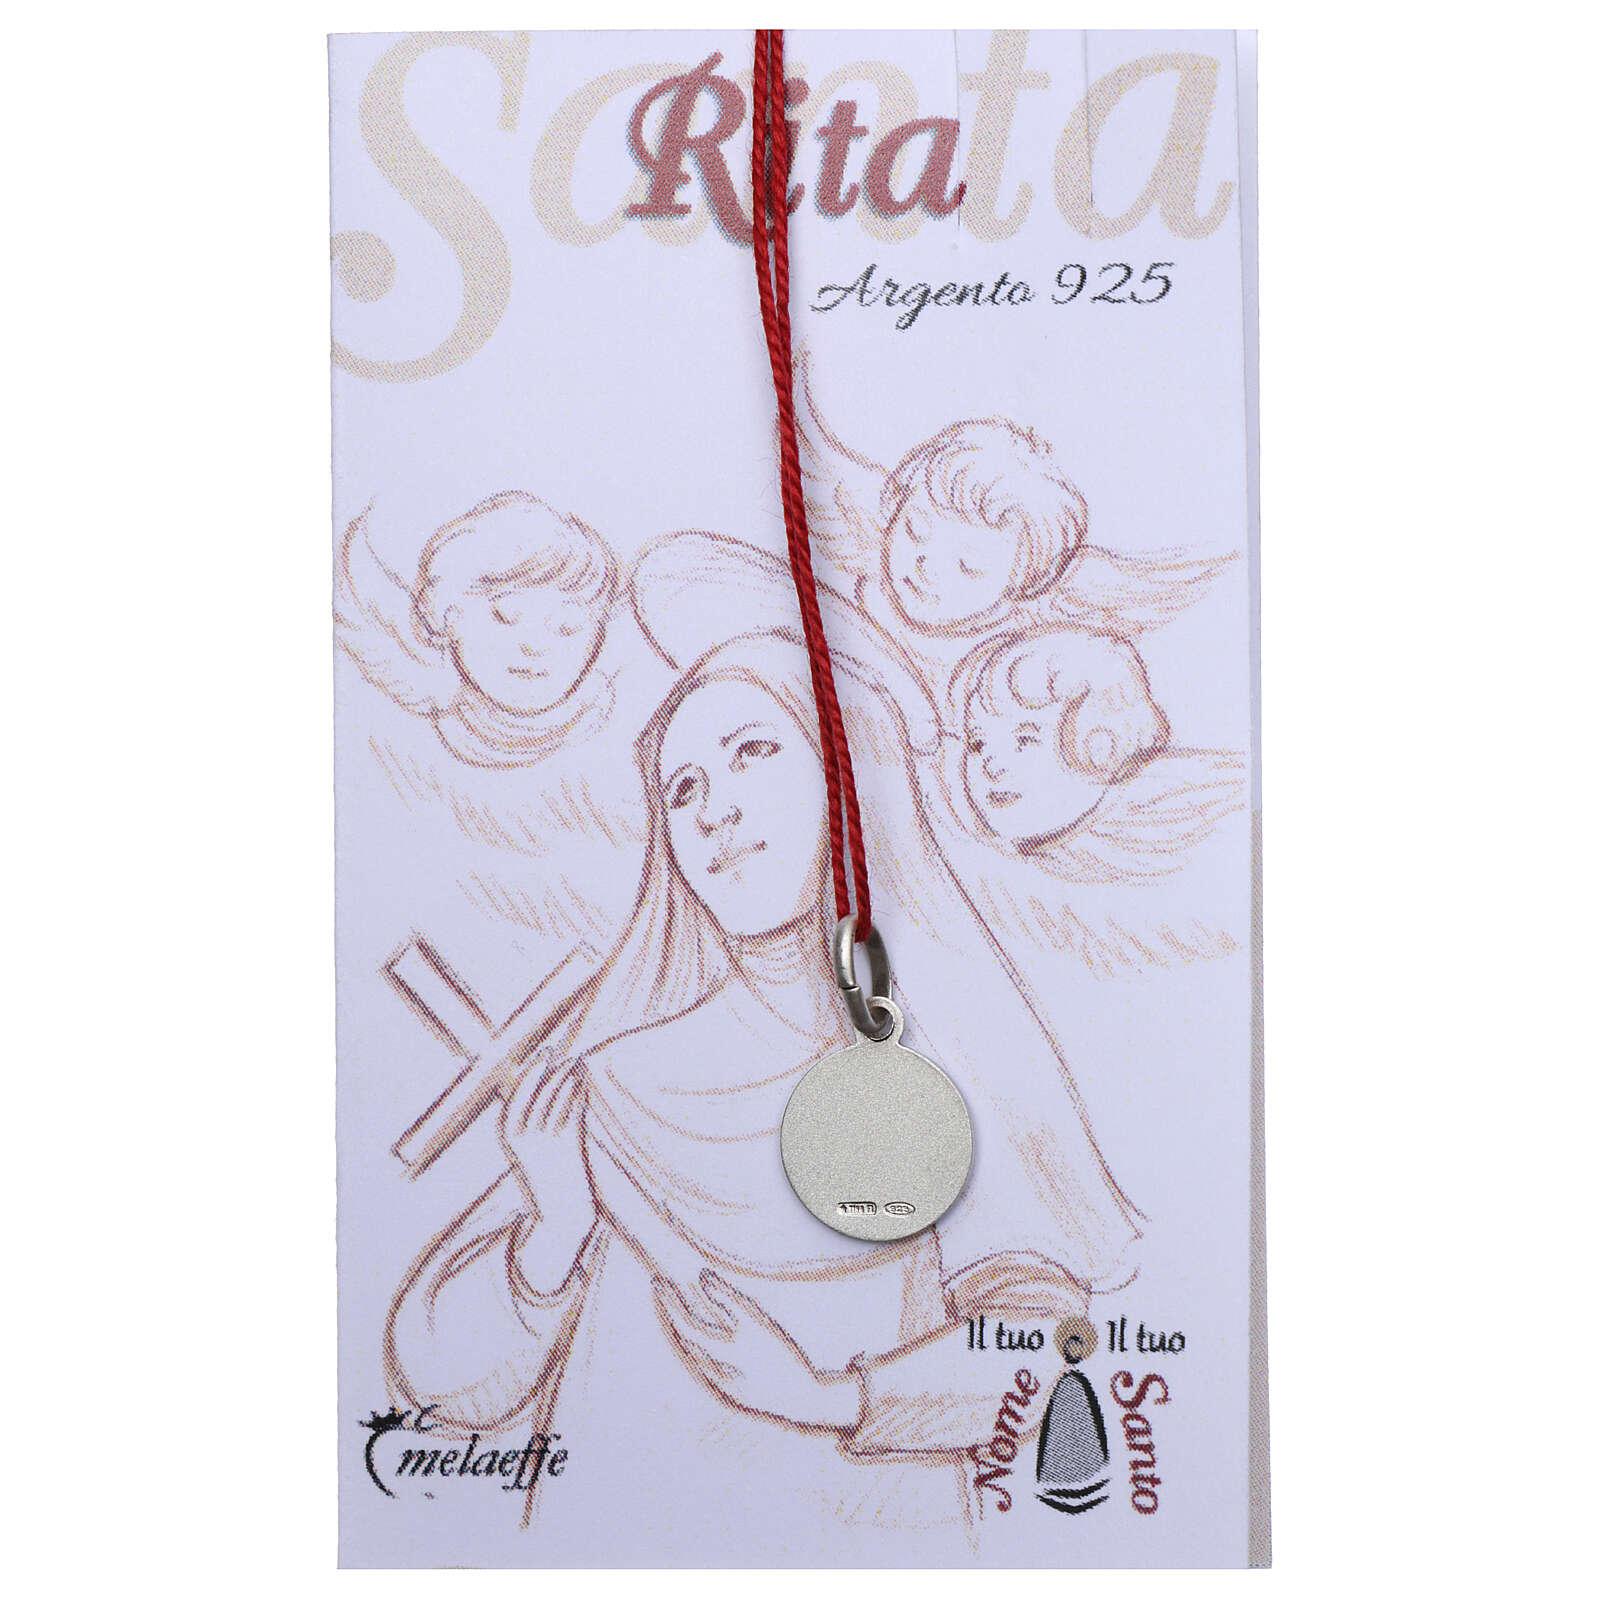 Saint Rita of Cascia medal 925 silver finished in rhodium 0.39 in 4